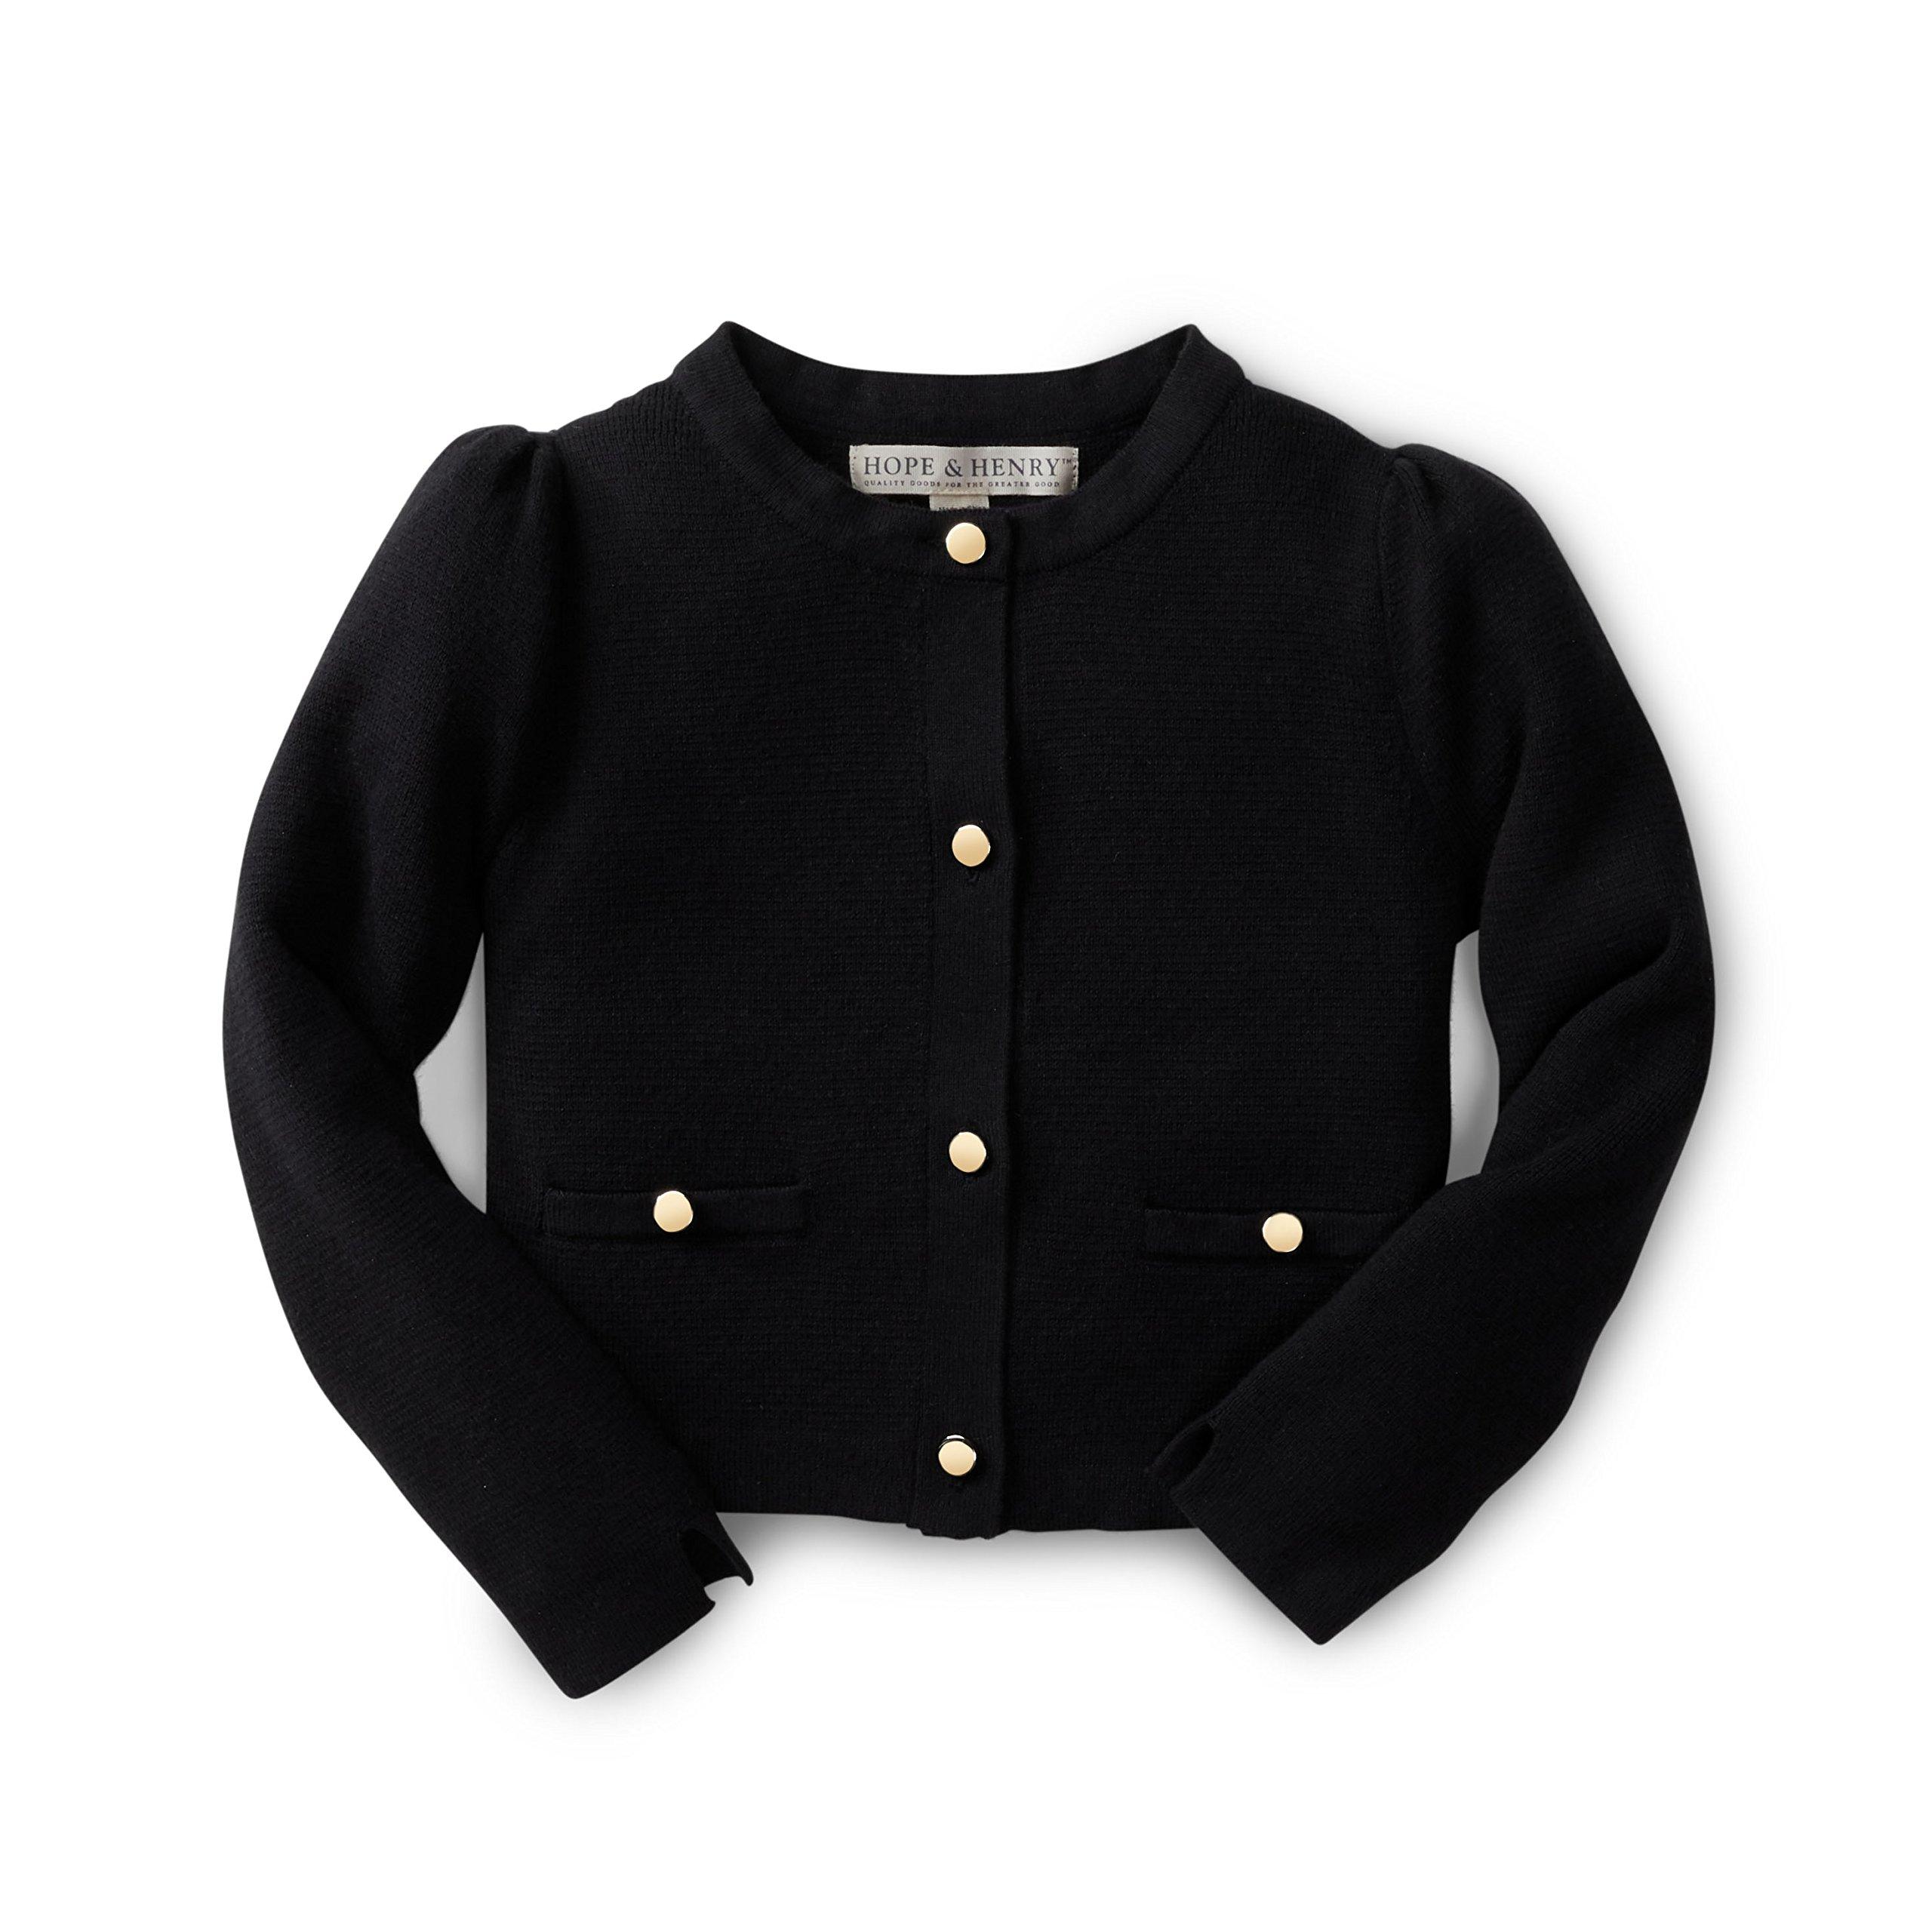 Hope & Henry Girls' Black Full Milano Sweater Jacket Made with Organic Cotton